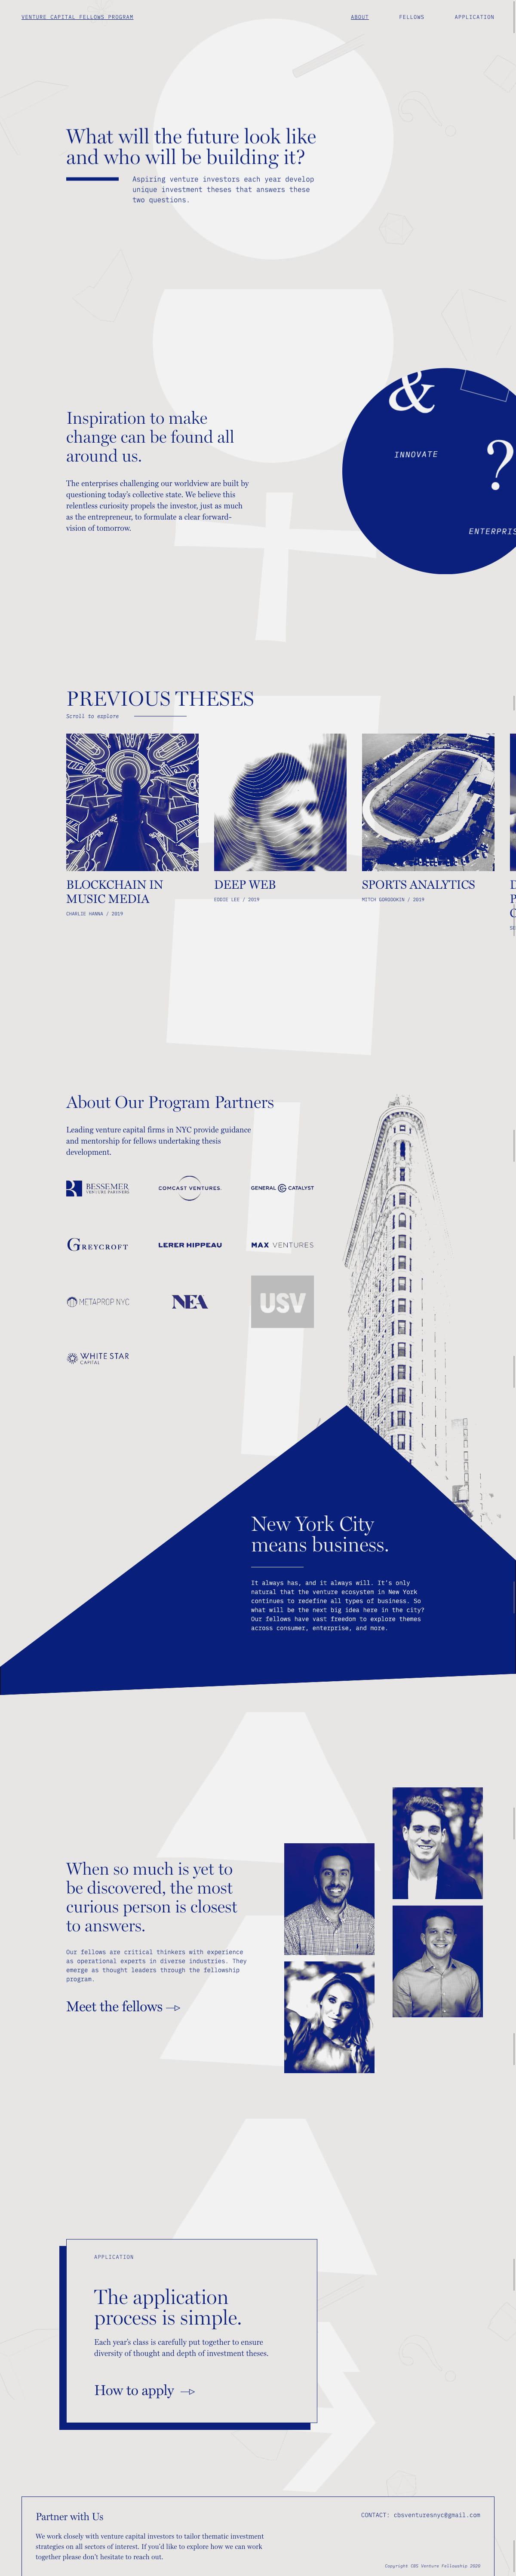 Venture Capital Fellows Program